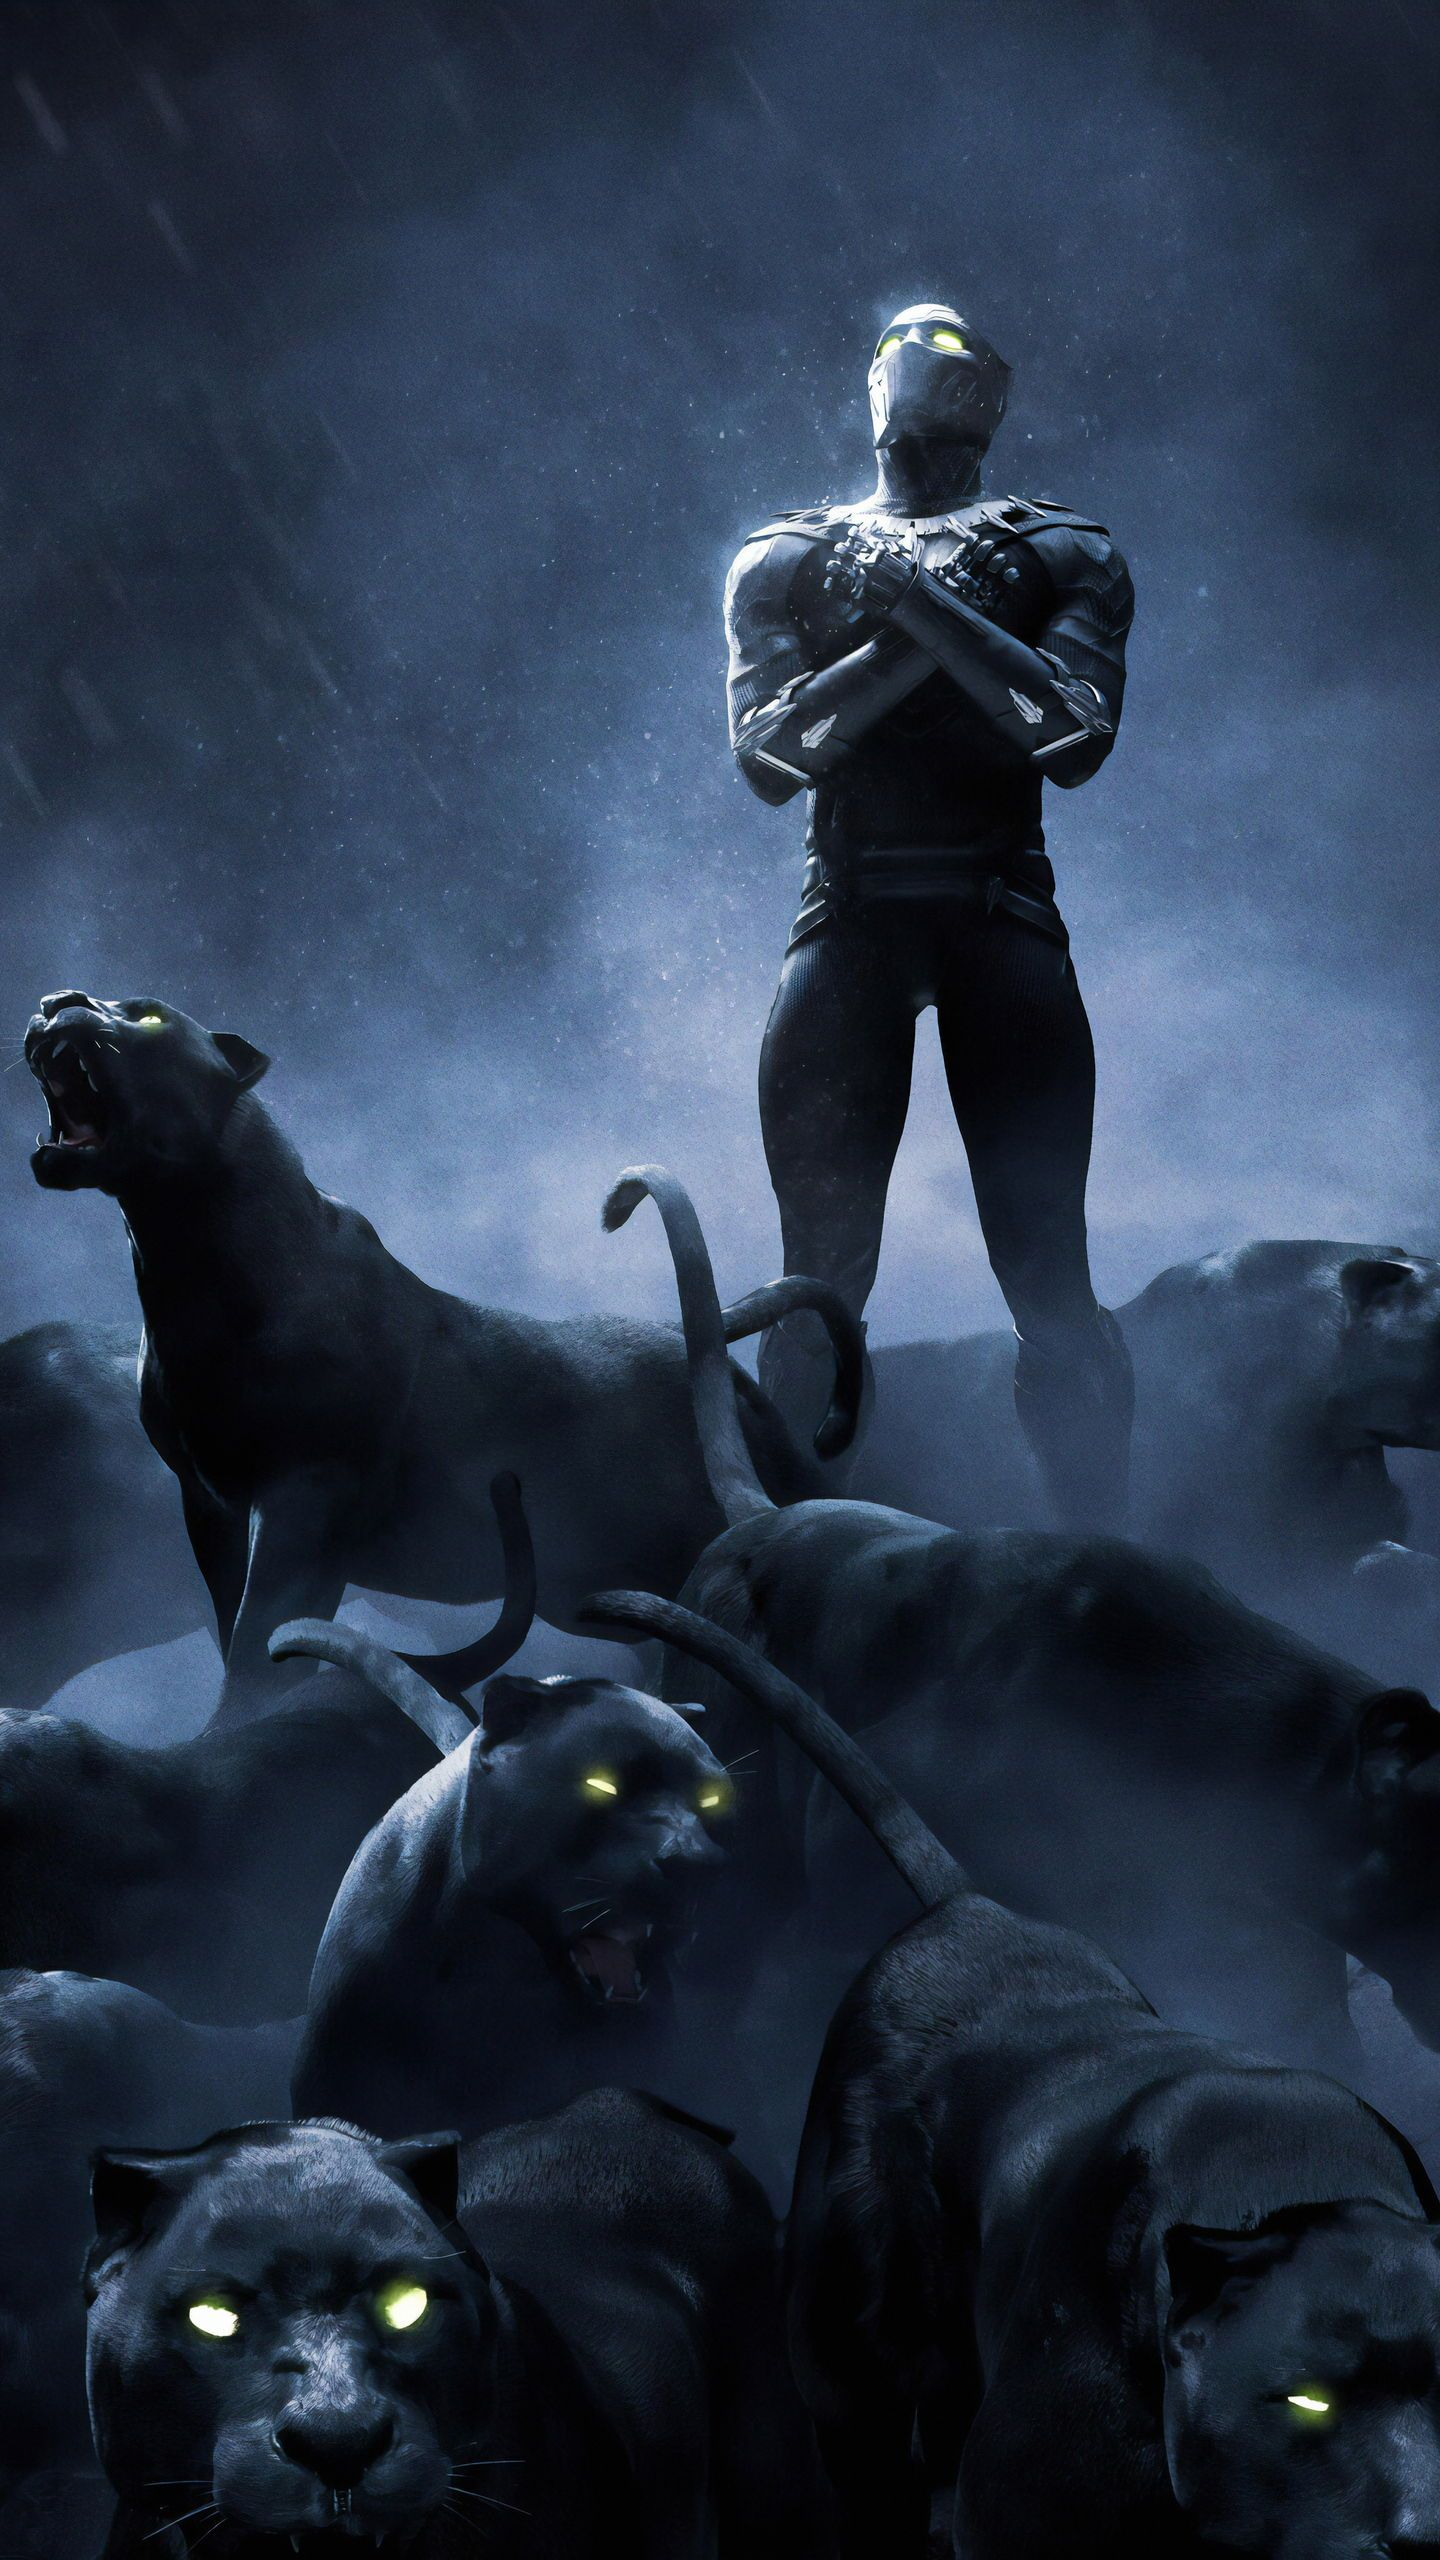 Black Panther 2 Confirmed Here S When It Is Releasing Marvel Cinematic Universe Marvel Studios Chadwick Black Panther Art Black Panther Marvel Panther Art